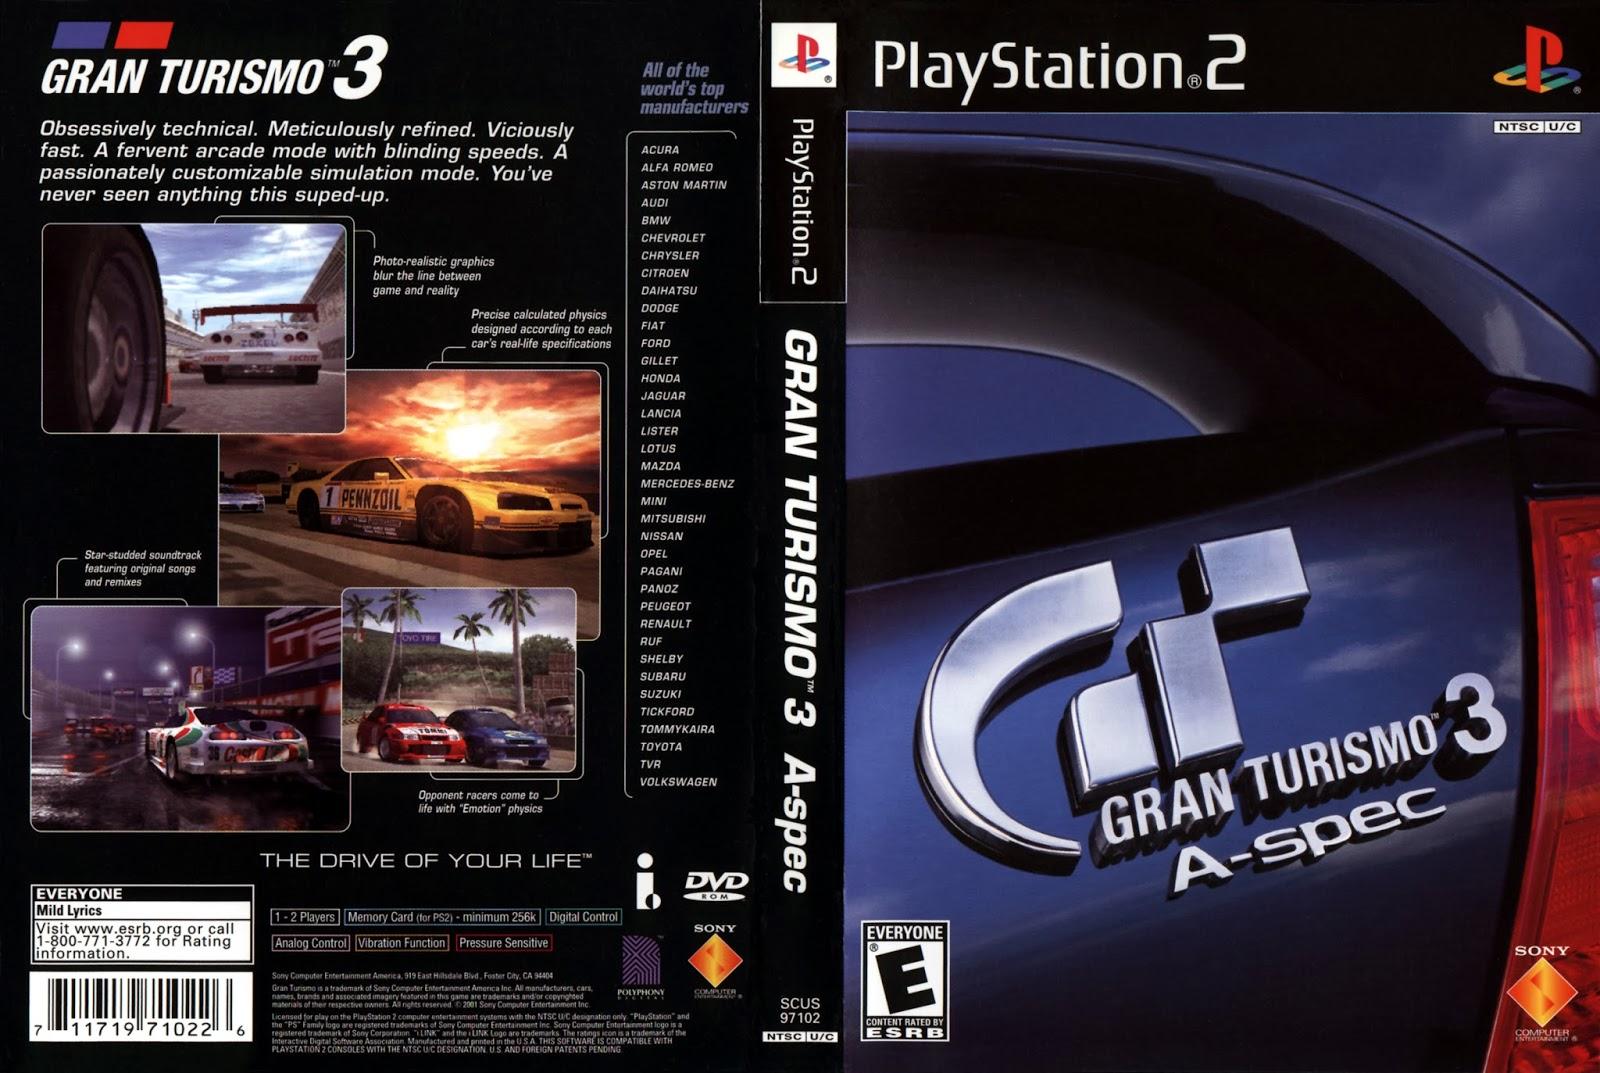 Gran Turismo 3 A Spec Playstation 2 Ultra Capas